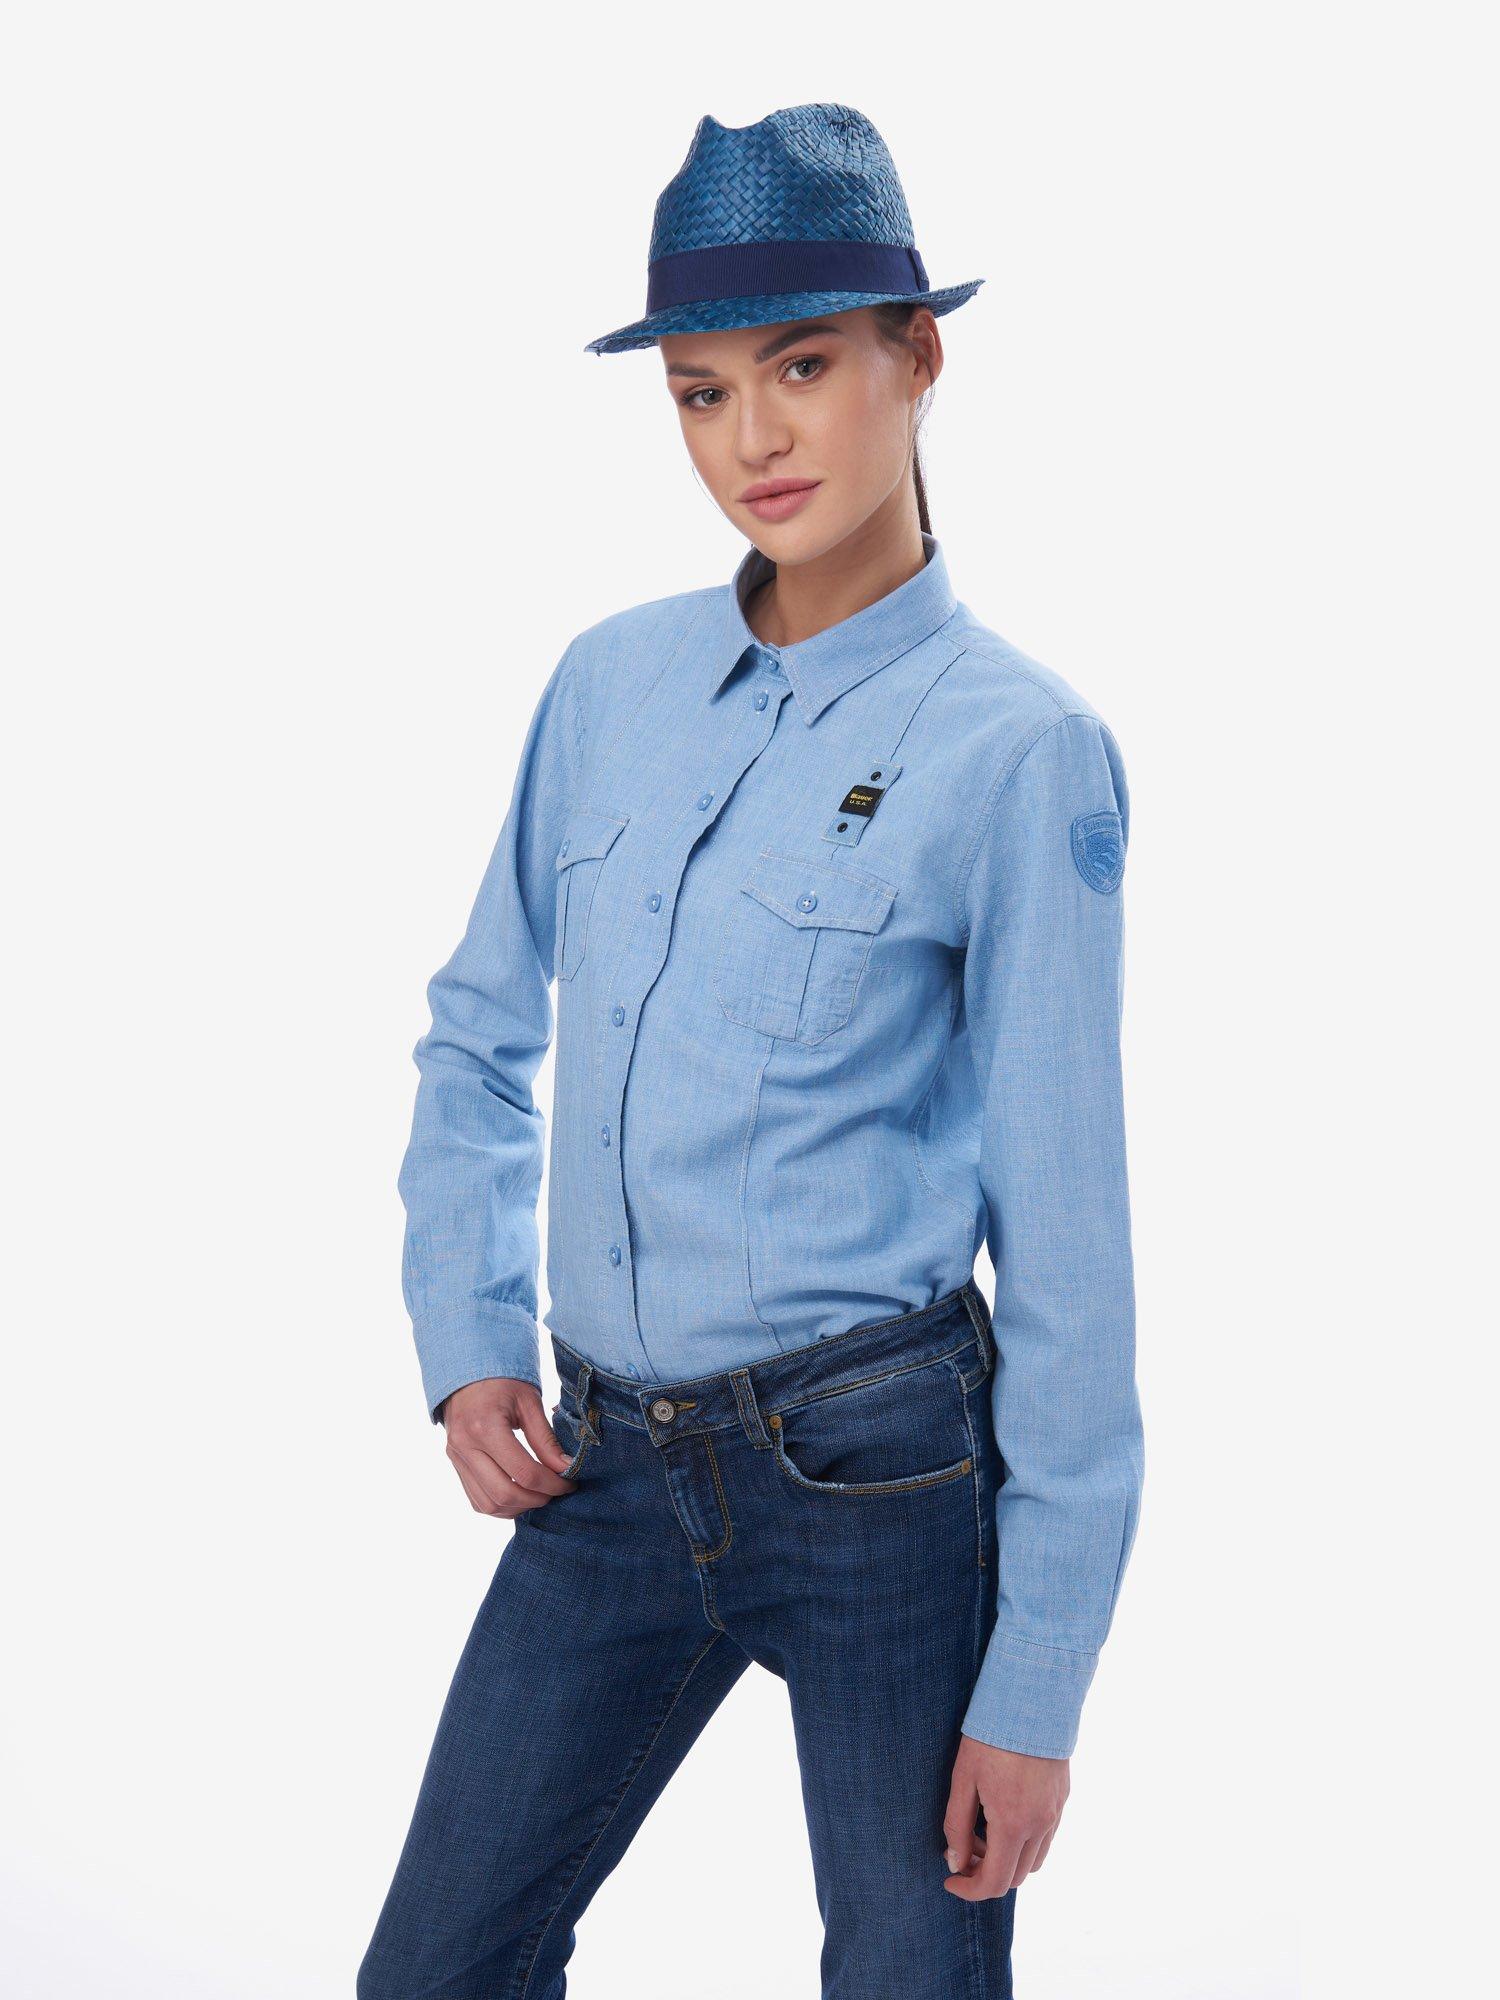 DENIM LOOK SHIRT - Blauer